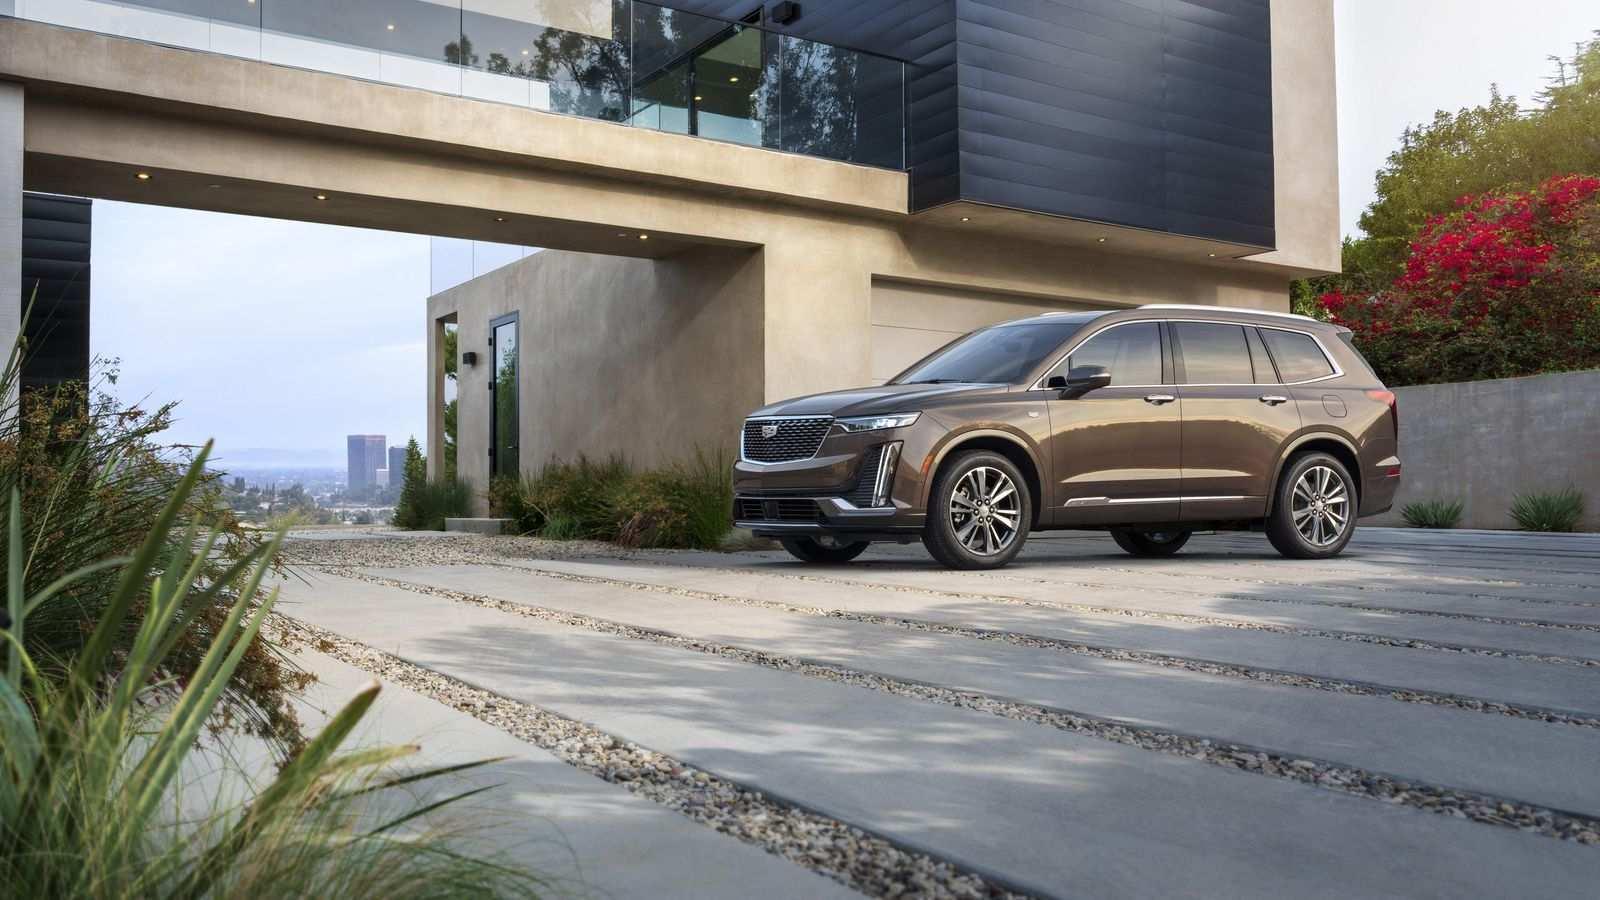 84 The 2020 Cadillac Xt6 Availability Ratings for 2020 Cadillac Xt6 Availability